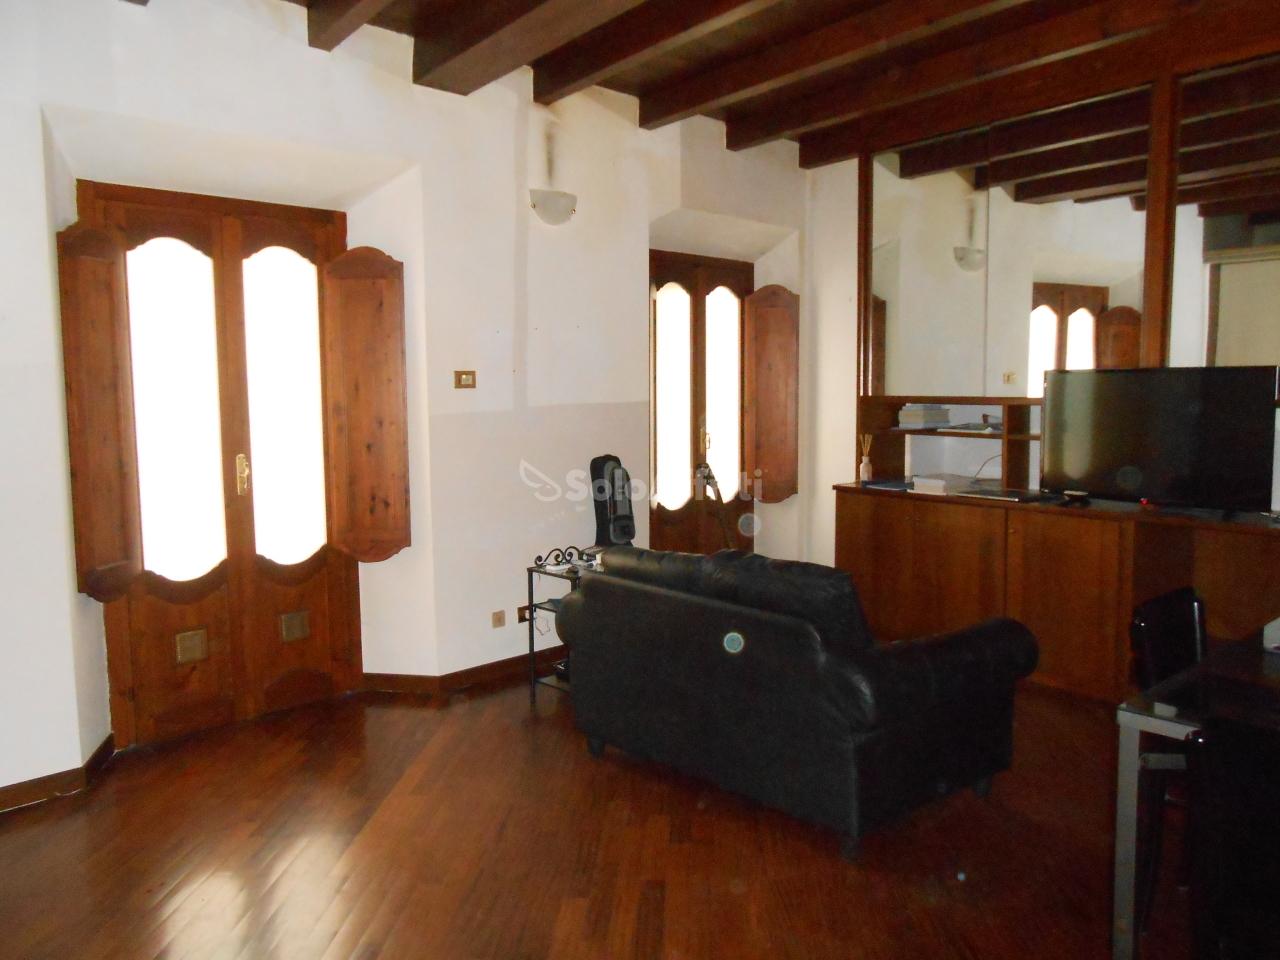 Appartamento, 60 Mq, Affitto - Pavia (Pavia)